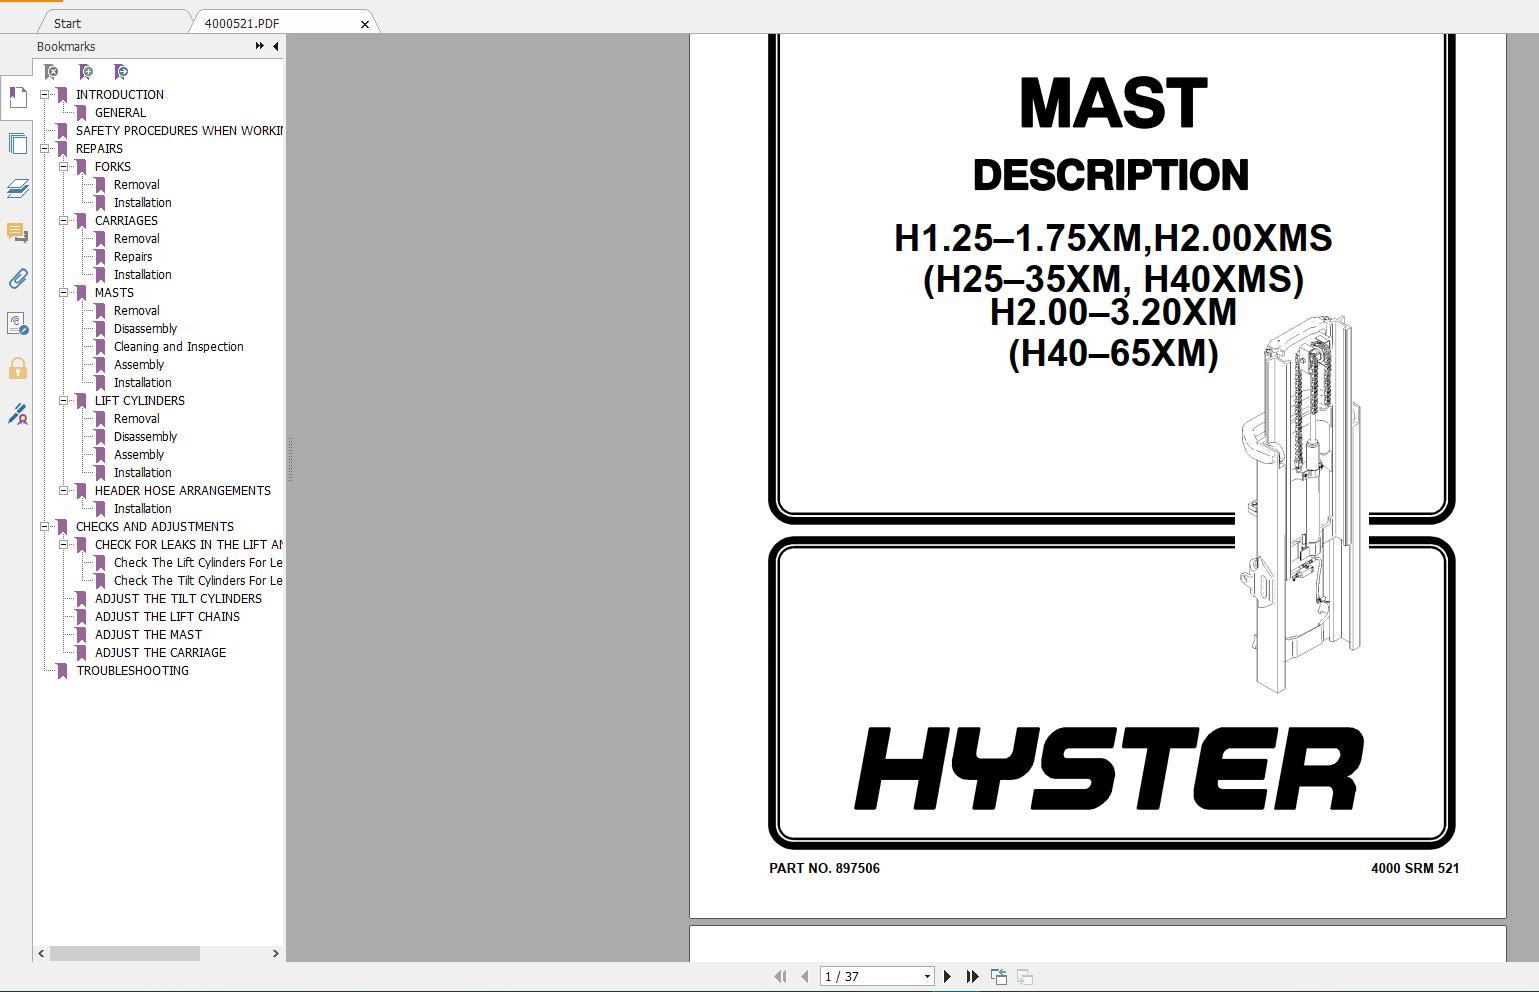 Hyster Forklift Class 5 Internal Combustion Engine Trucks Repair Manuals